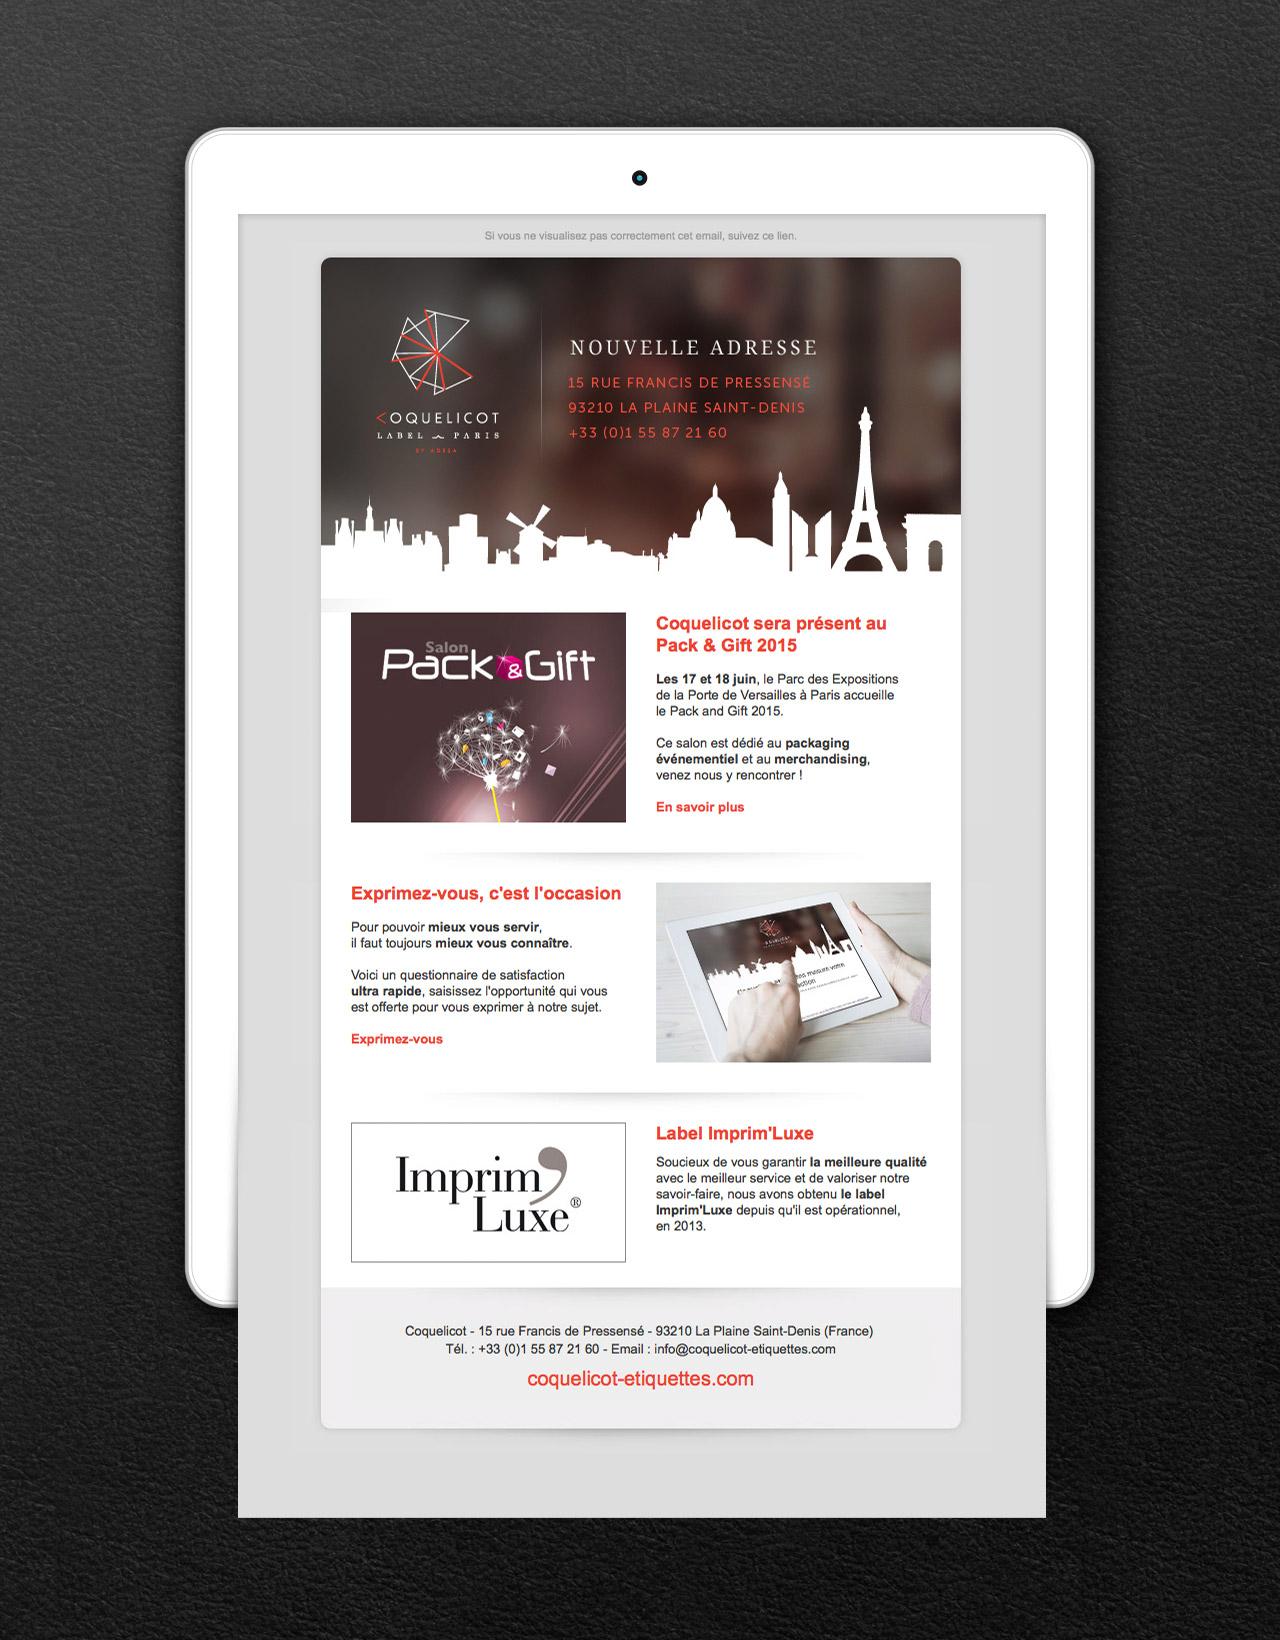 coquelicot-newsletter-mailing-3-design-creation-communication-caconcept-alexis-cretin-graphiste